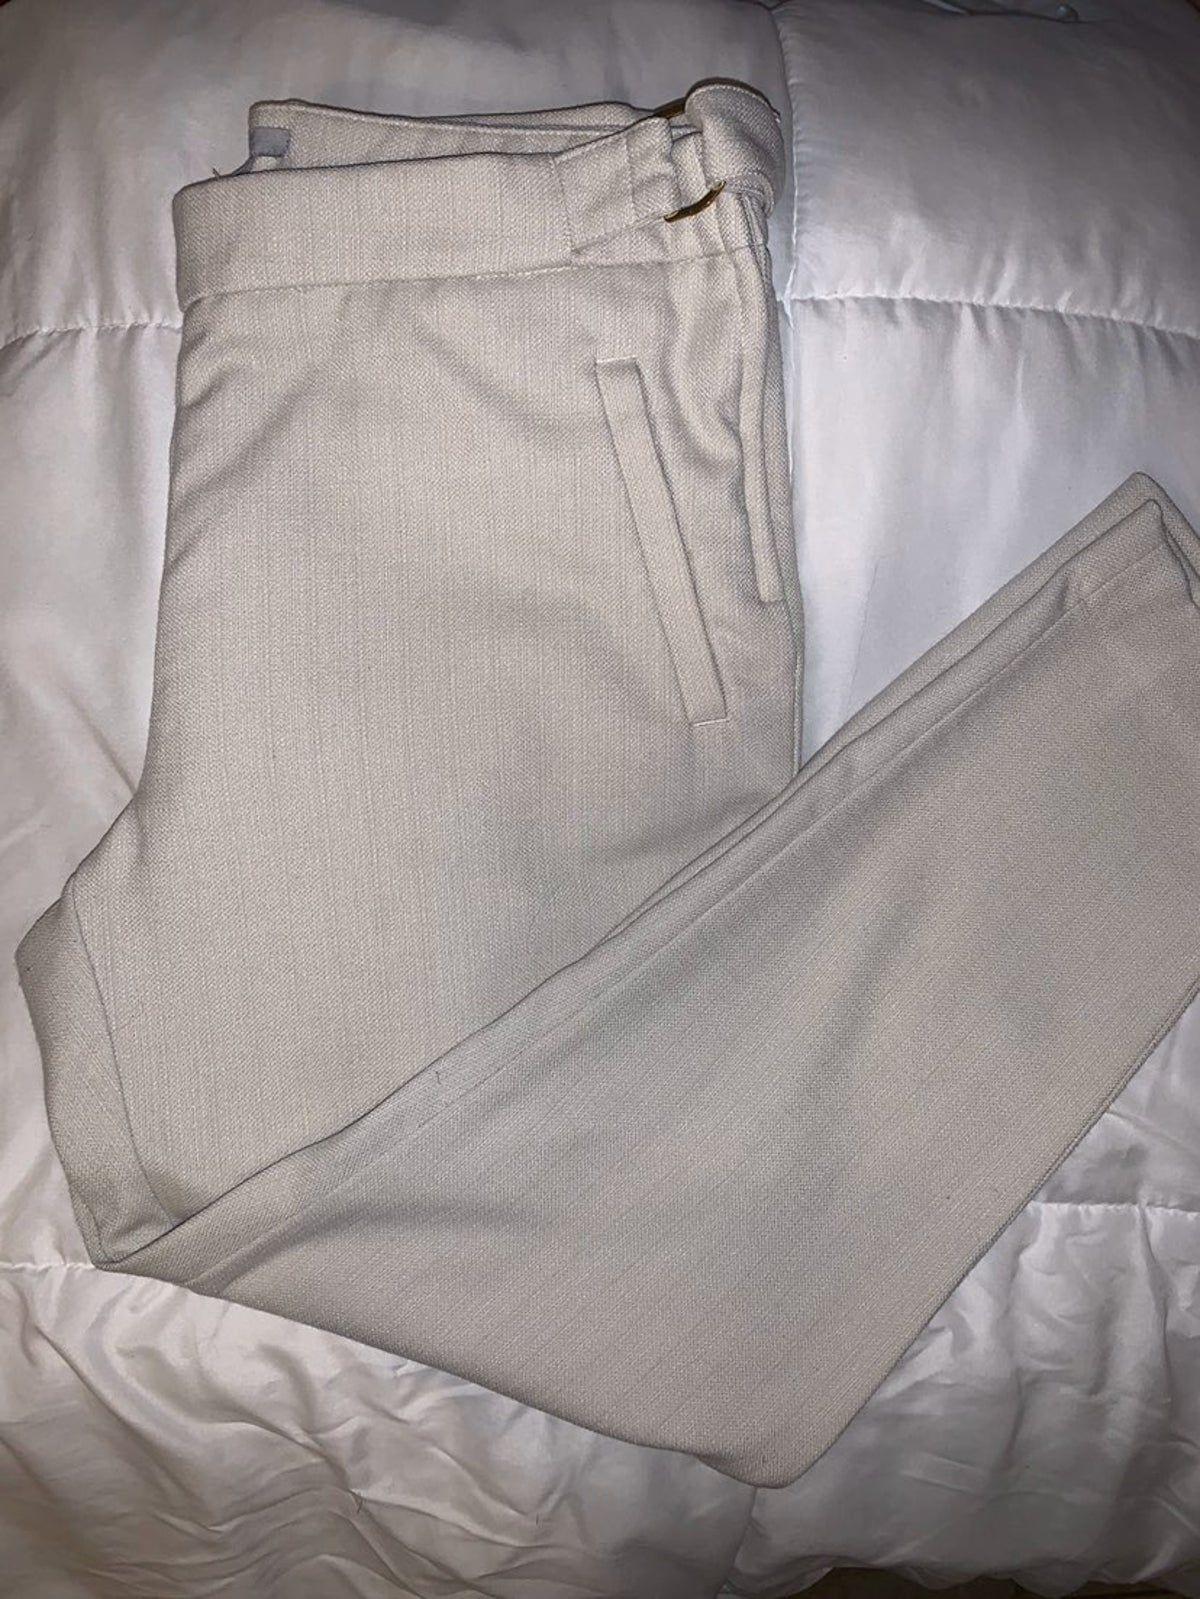 Canvas tan work/dress pants